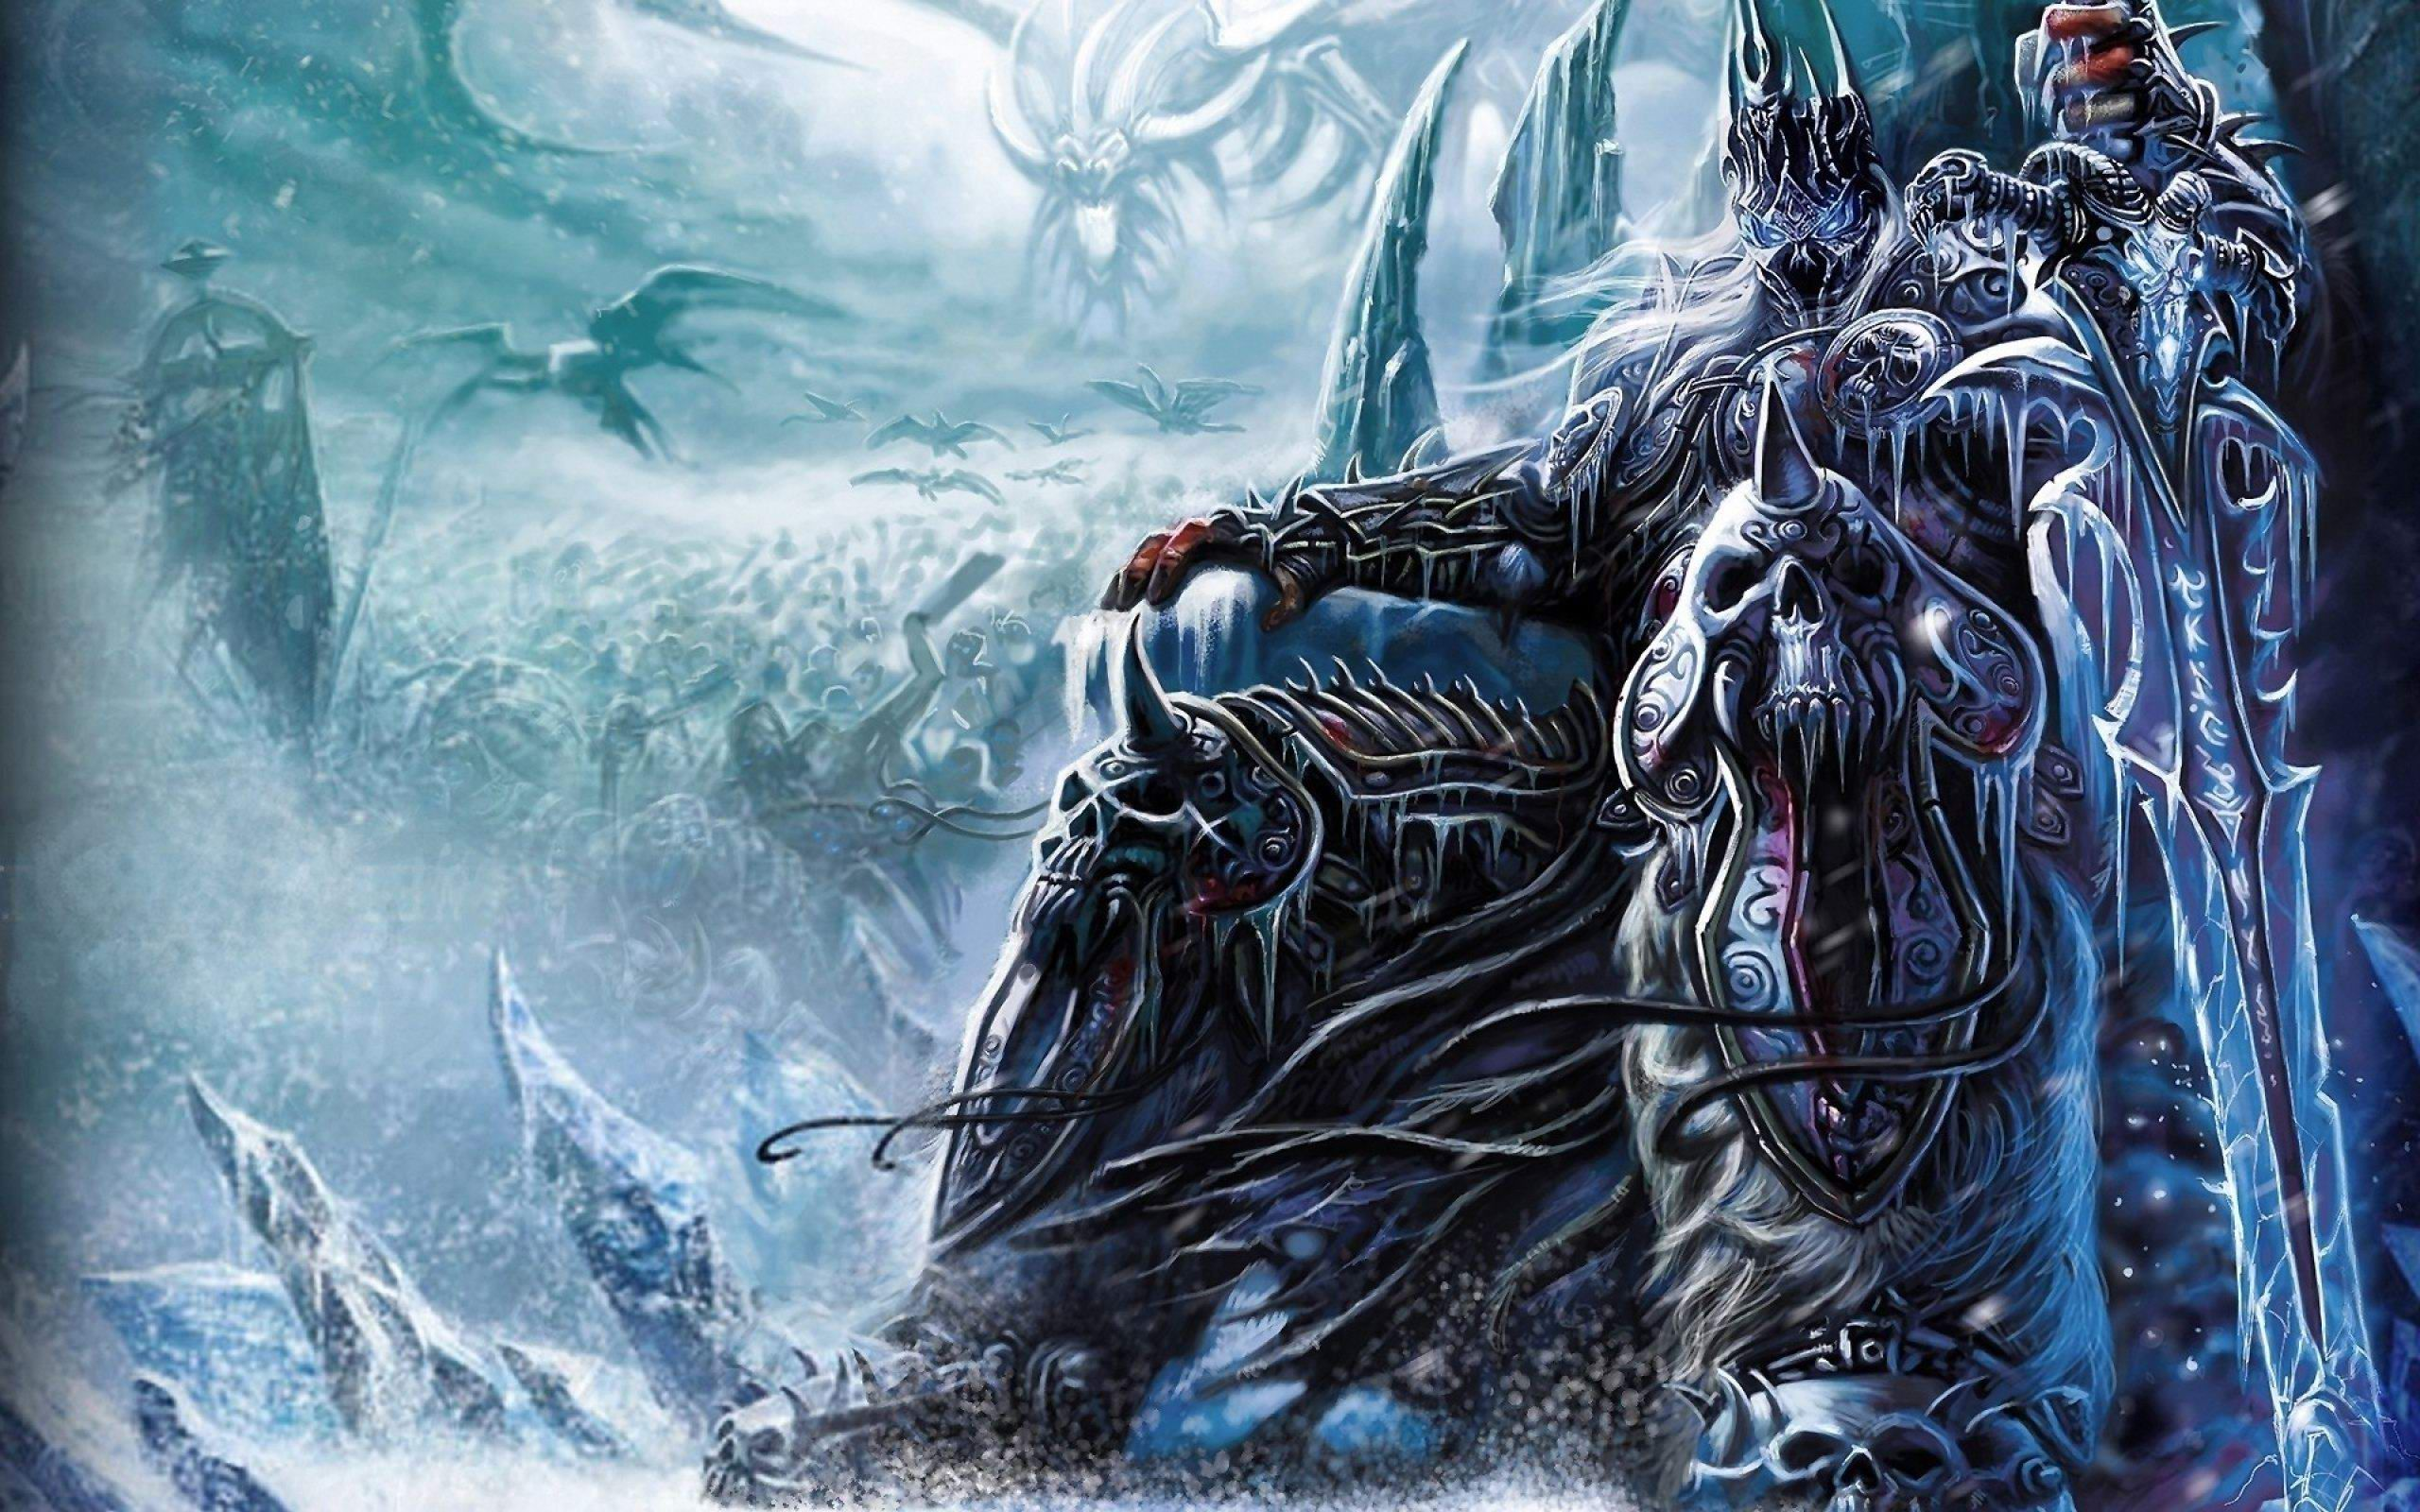 King Wallpaper World Of Warcraft Wallpaper Warriors Wallpaper World Of Warcraft